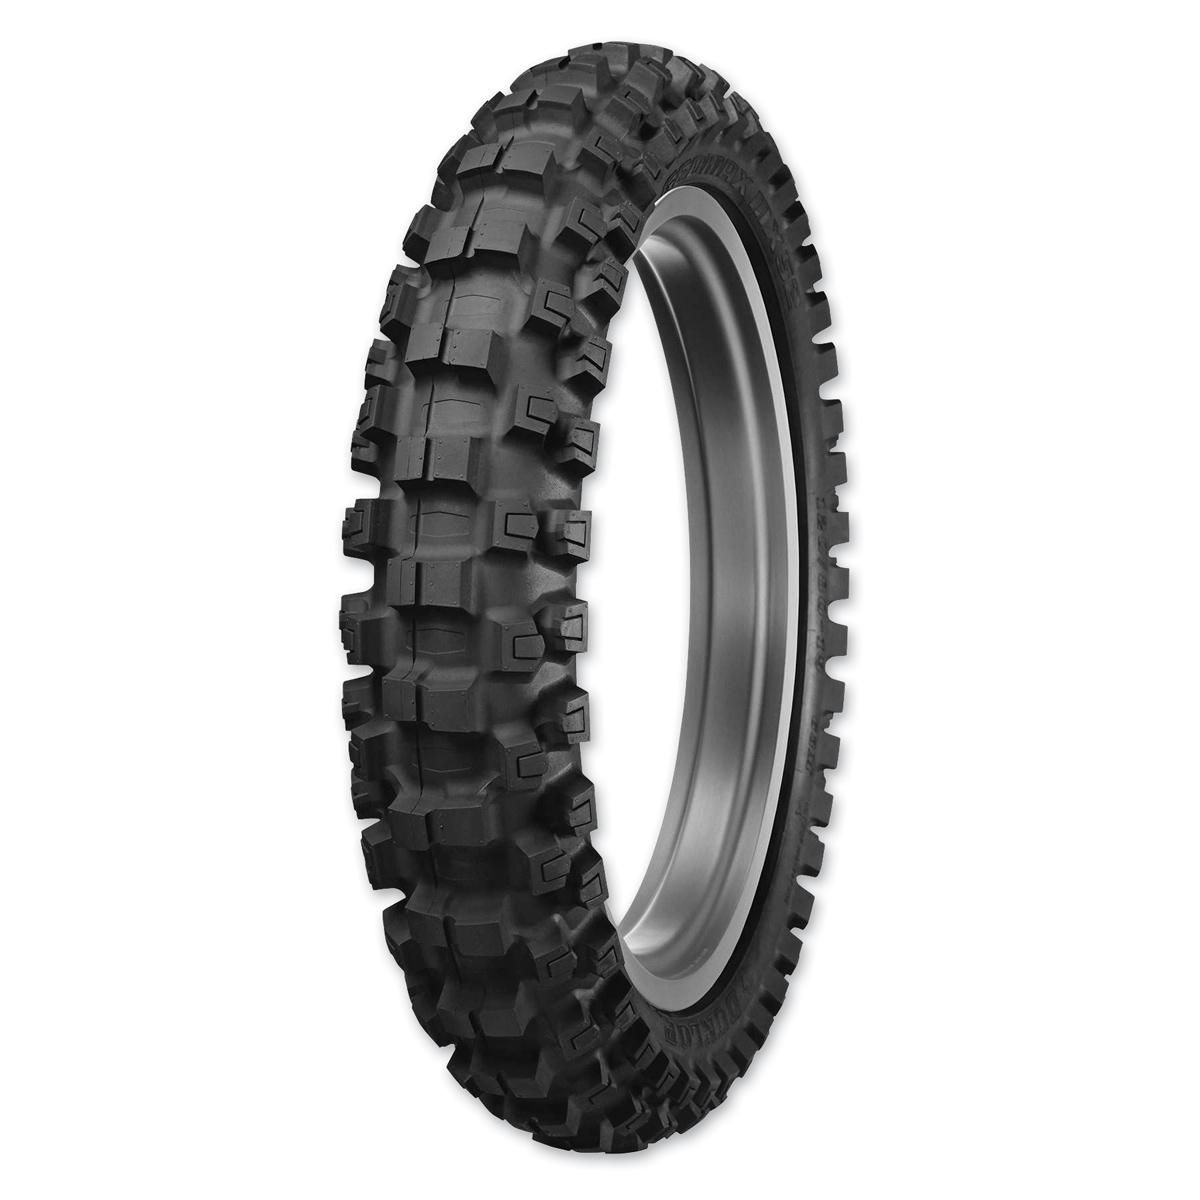 Dunlop MX52 70/100-10 I/T-H/T Rear Tire